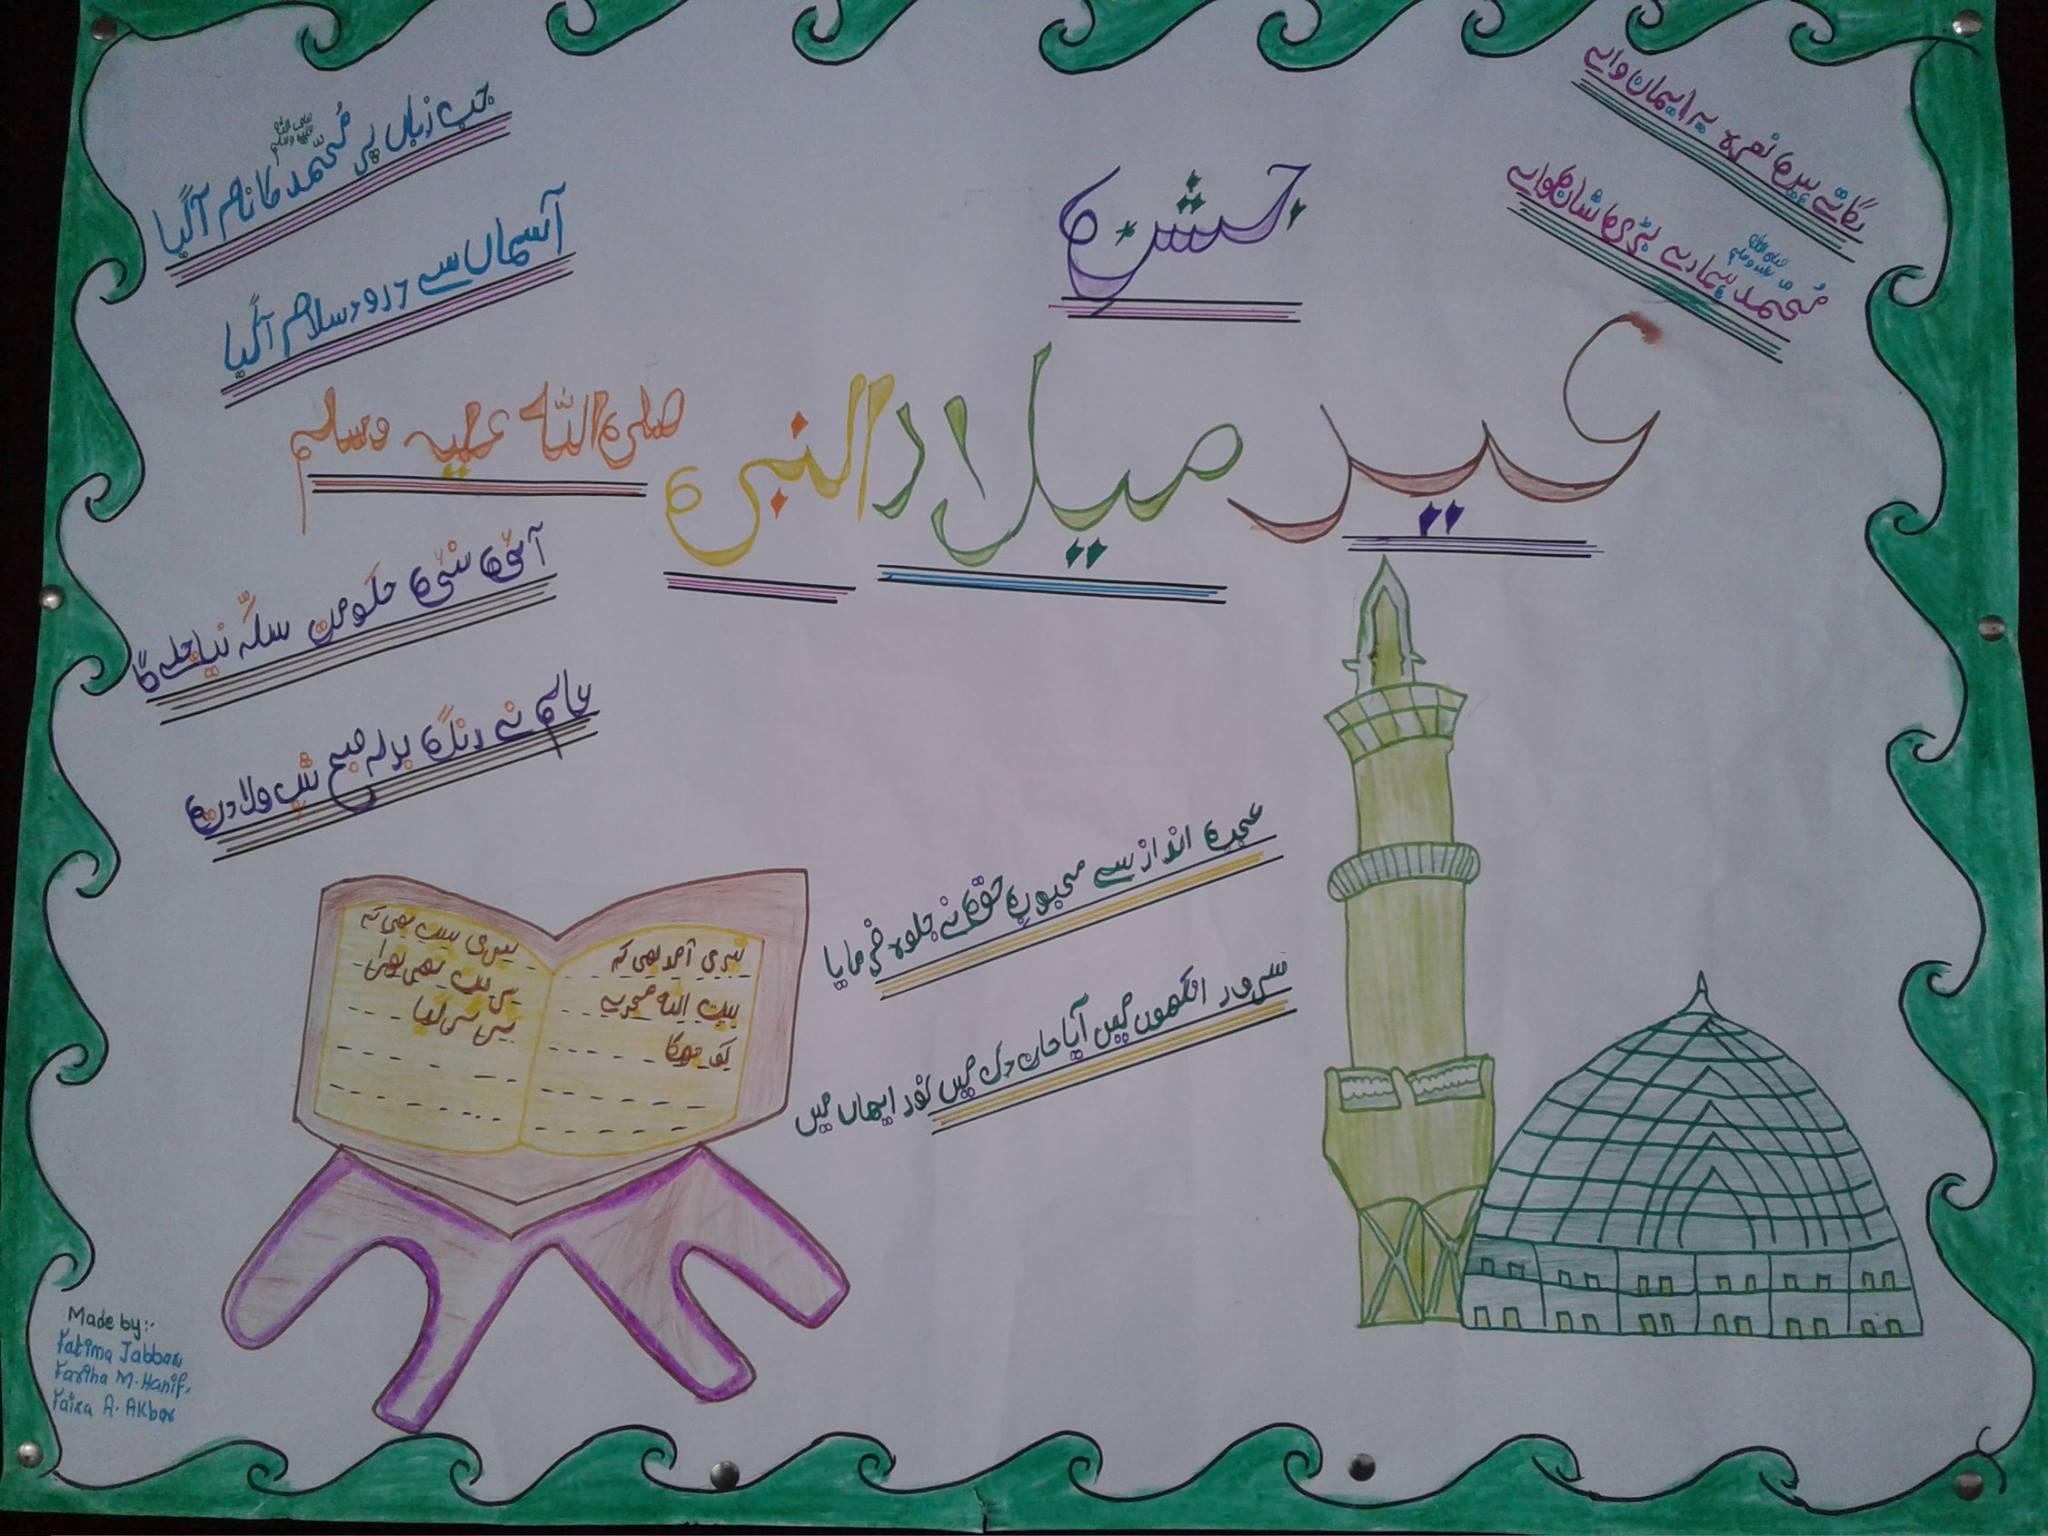 essay on eid-e-milad-un-nabi in urdu